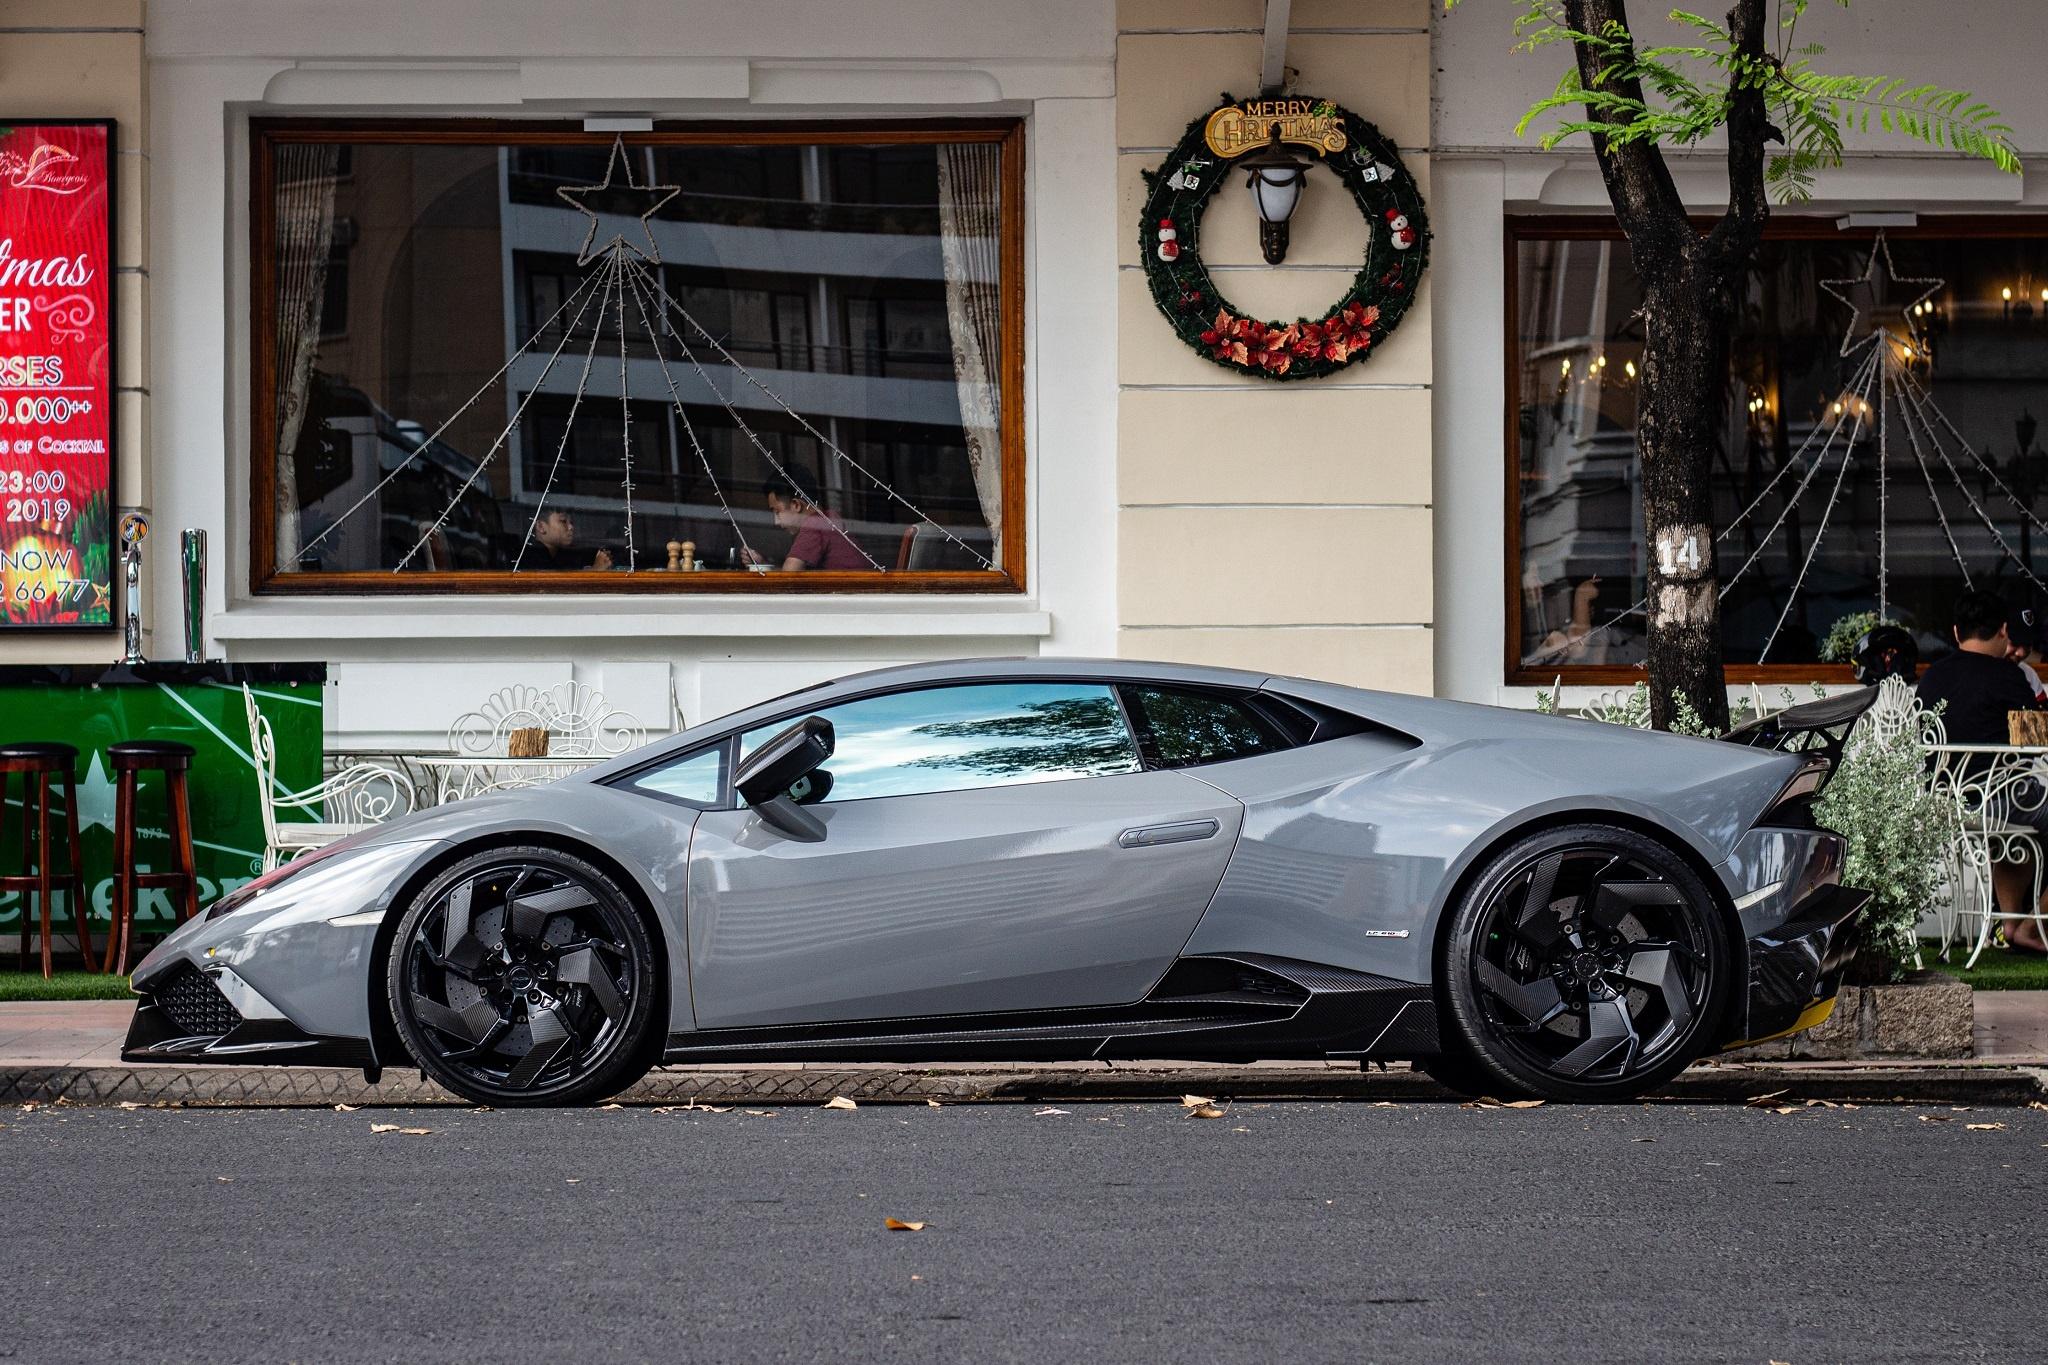 Lamborghini Huracan do Mansory xuat hien tai TP.HCM hinh anh 5 HuracanGrey_18_zing.jpg